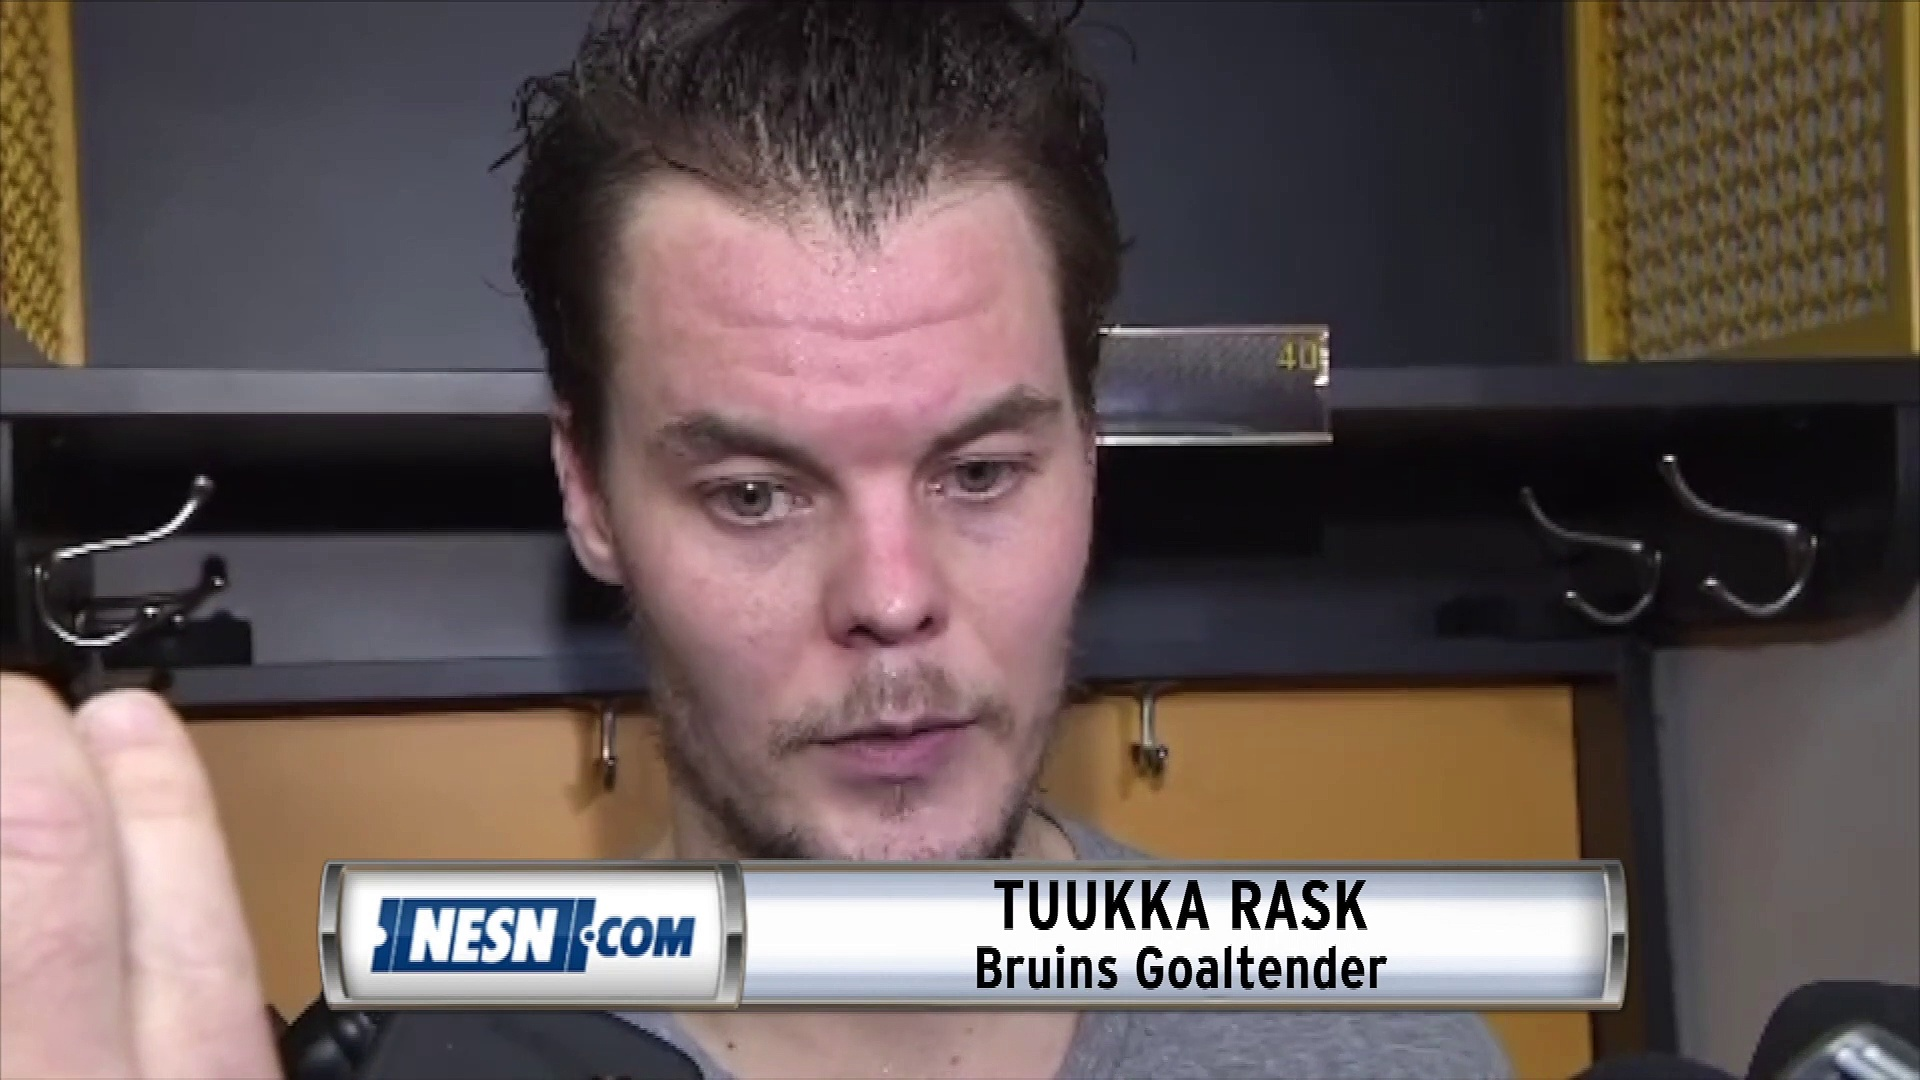 Tuukka Rask On Bruins-Hurricanes Series Not Being Over Despite 2-0 Lead